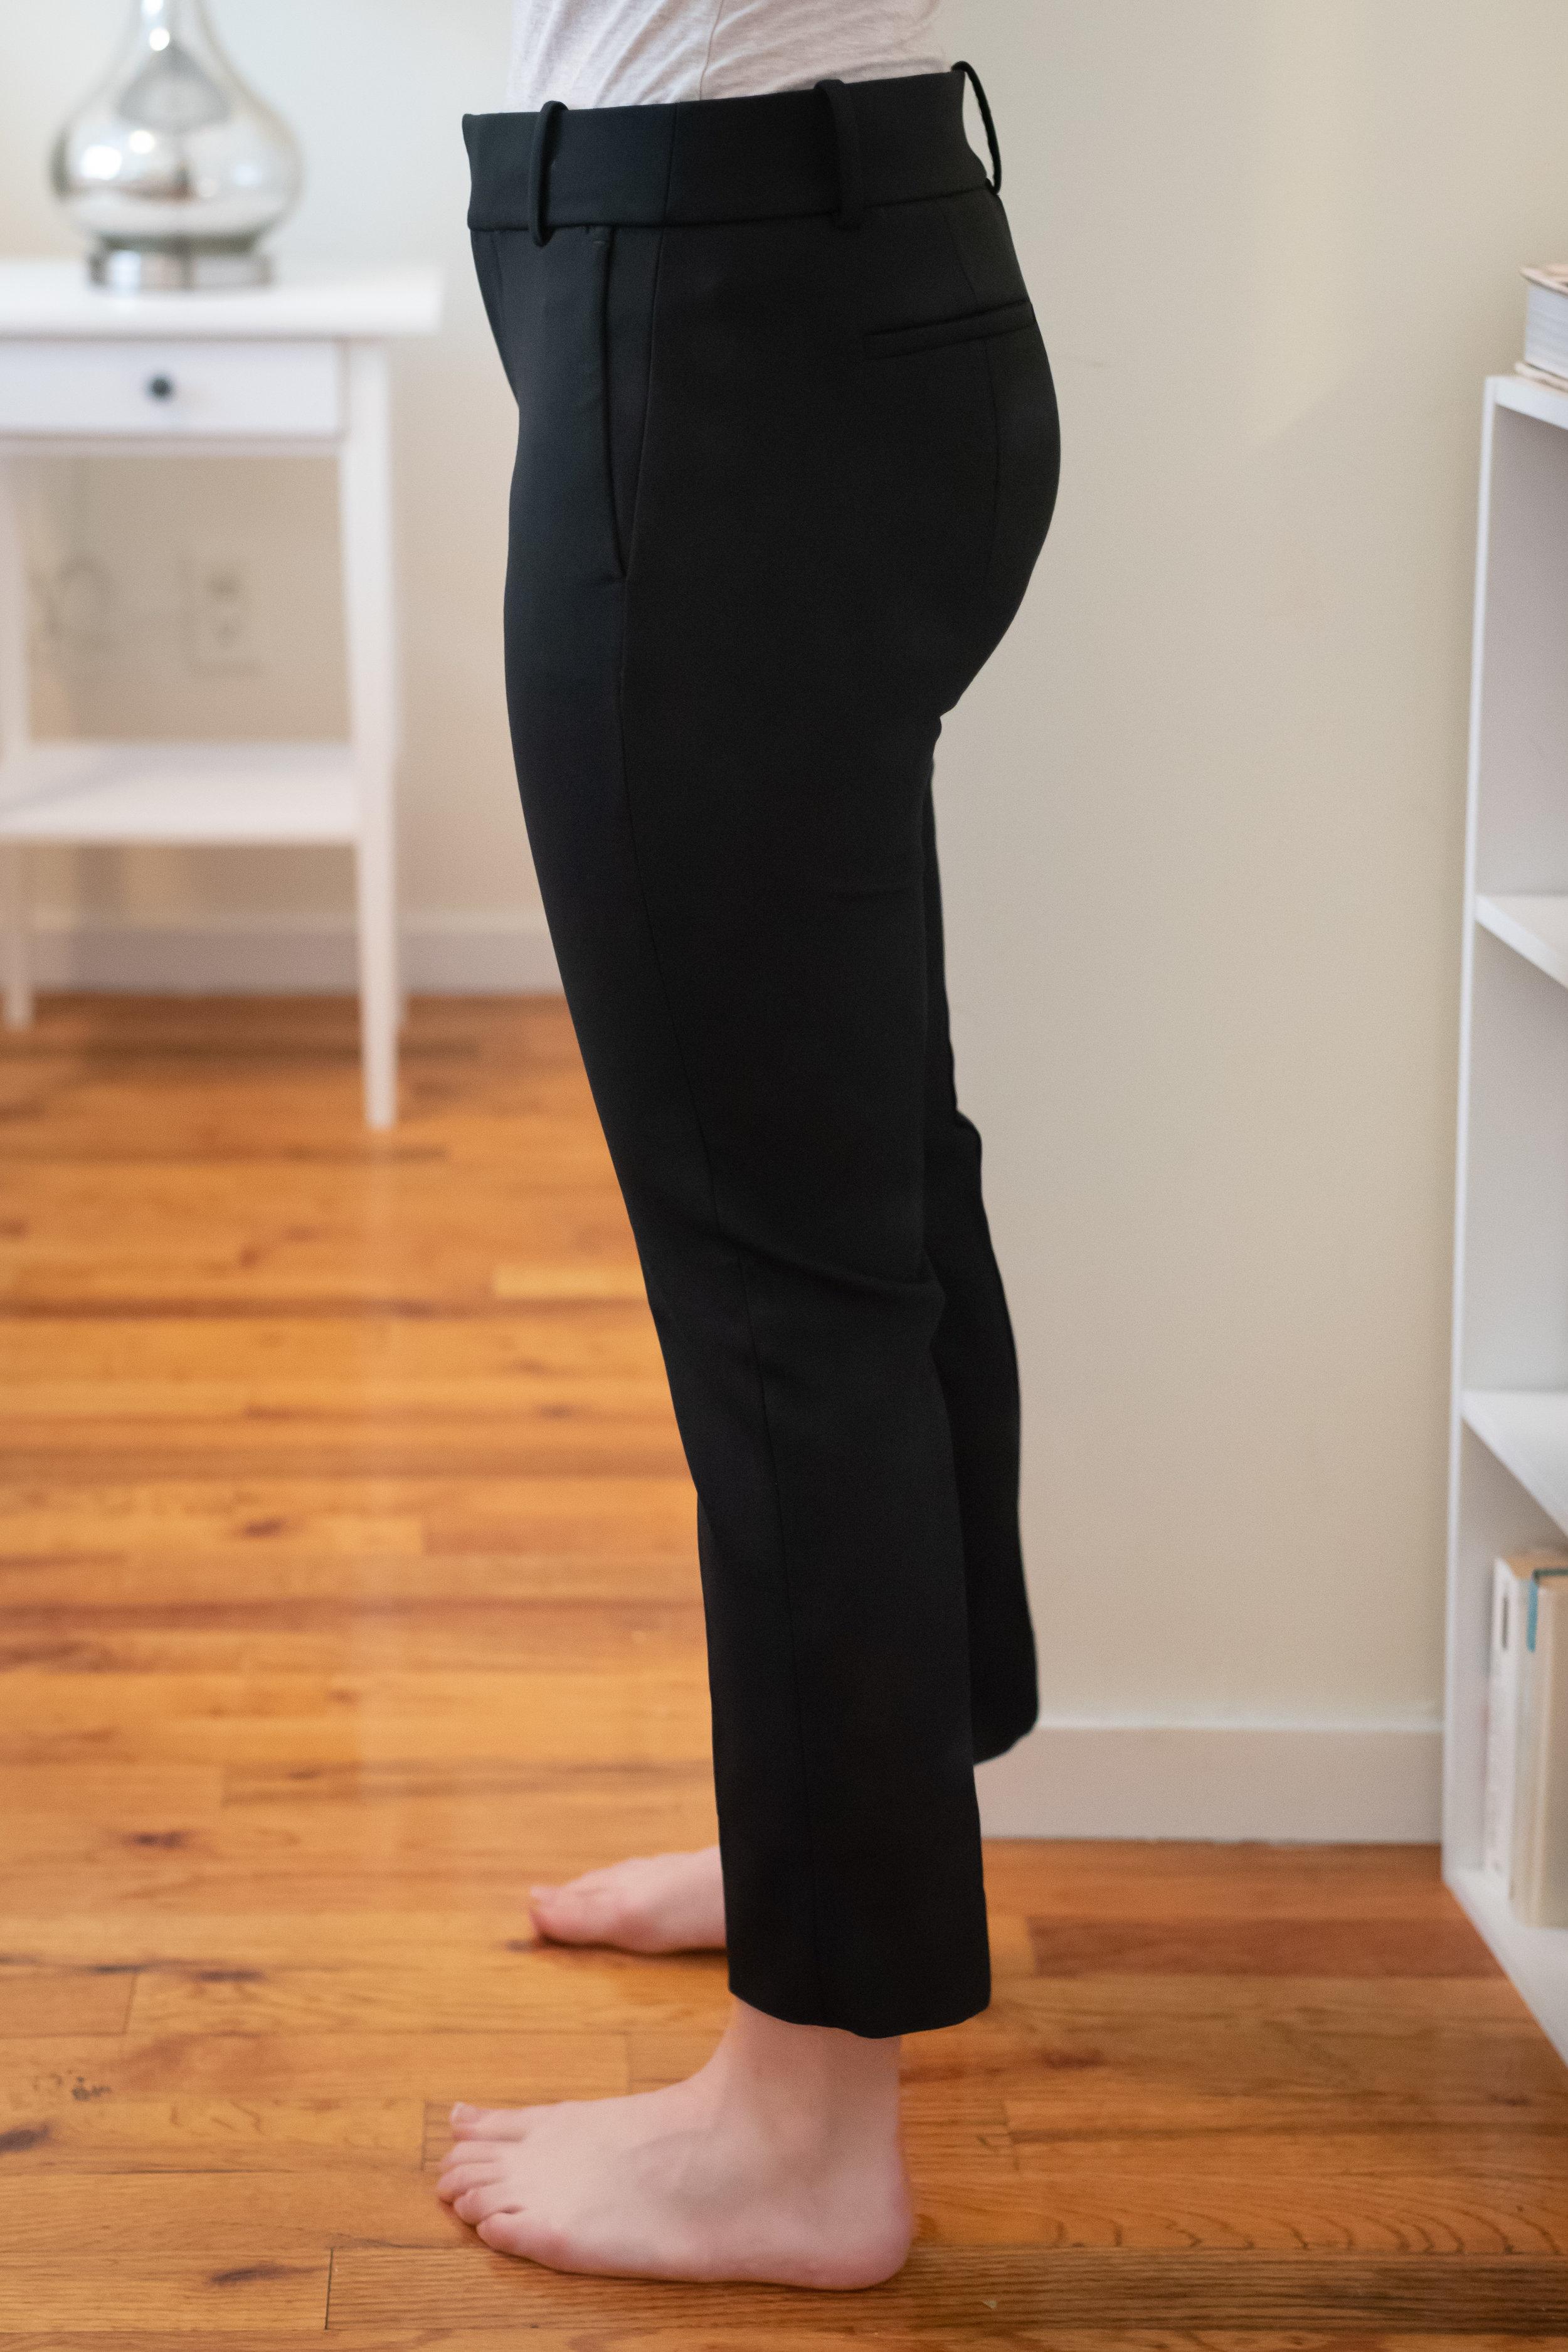 J. Crew Cameron Slim Crop Pant - Size 6 Petite - Side View